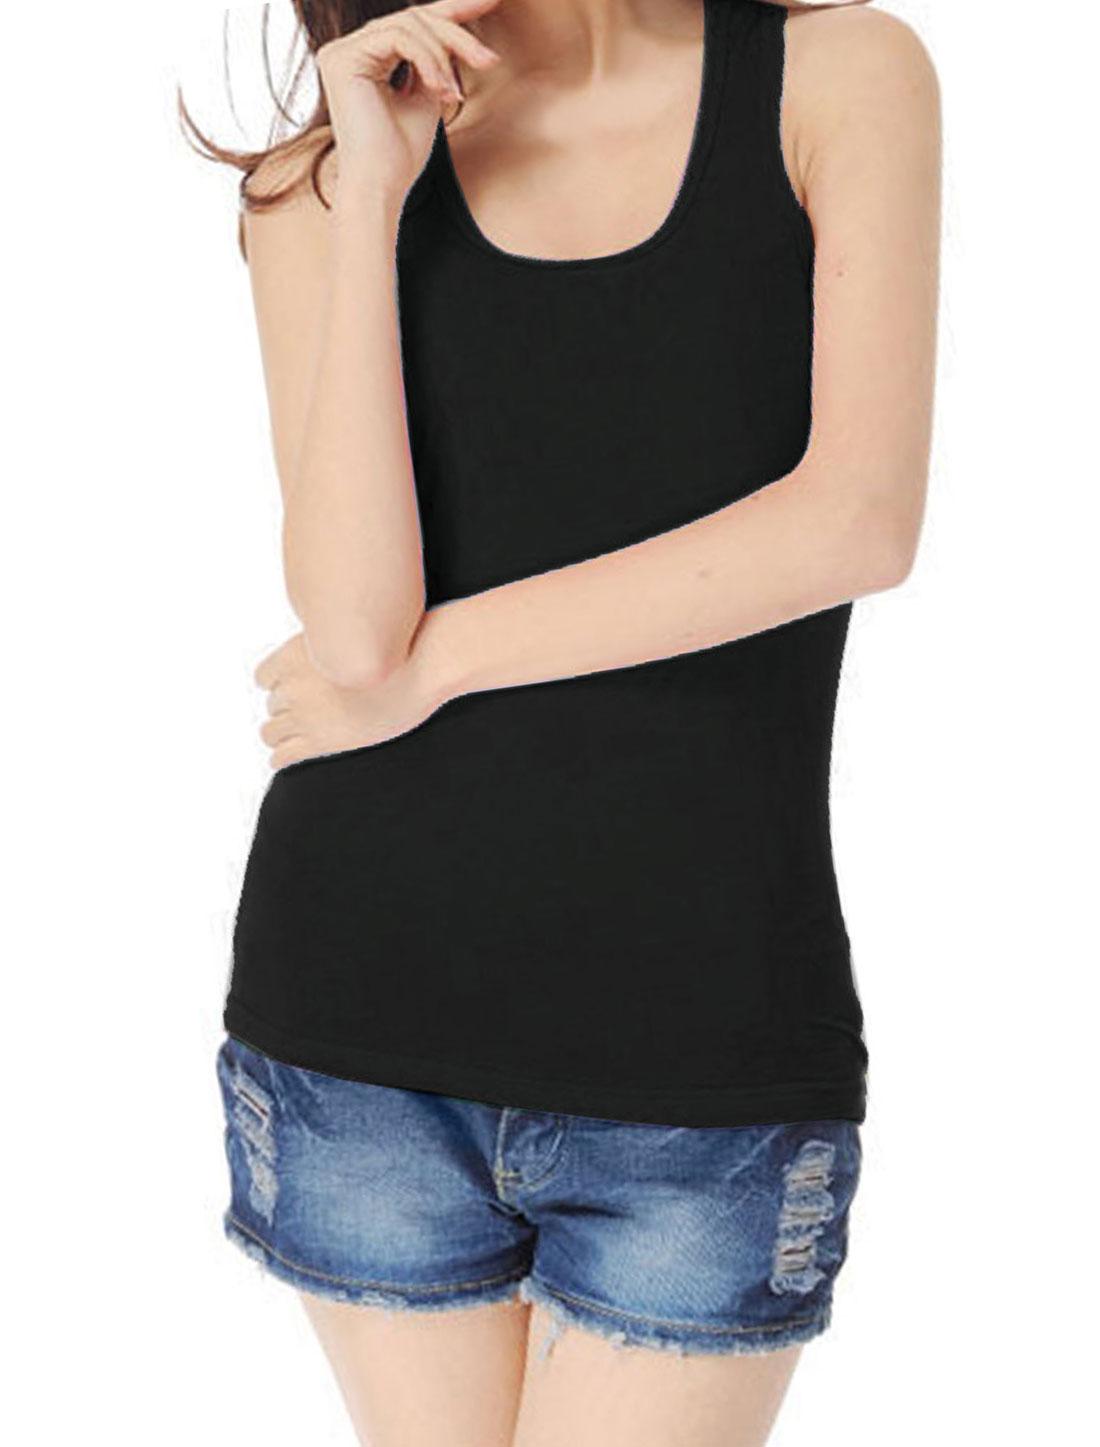 Woman Ribbing Pure Black Stretch Closefitting Racer Back Tank Top XS